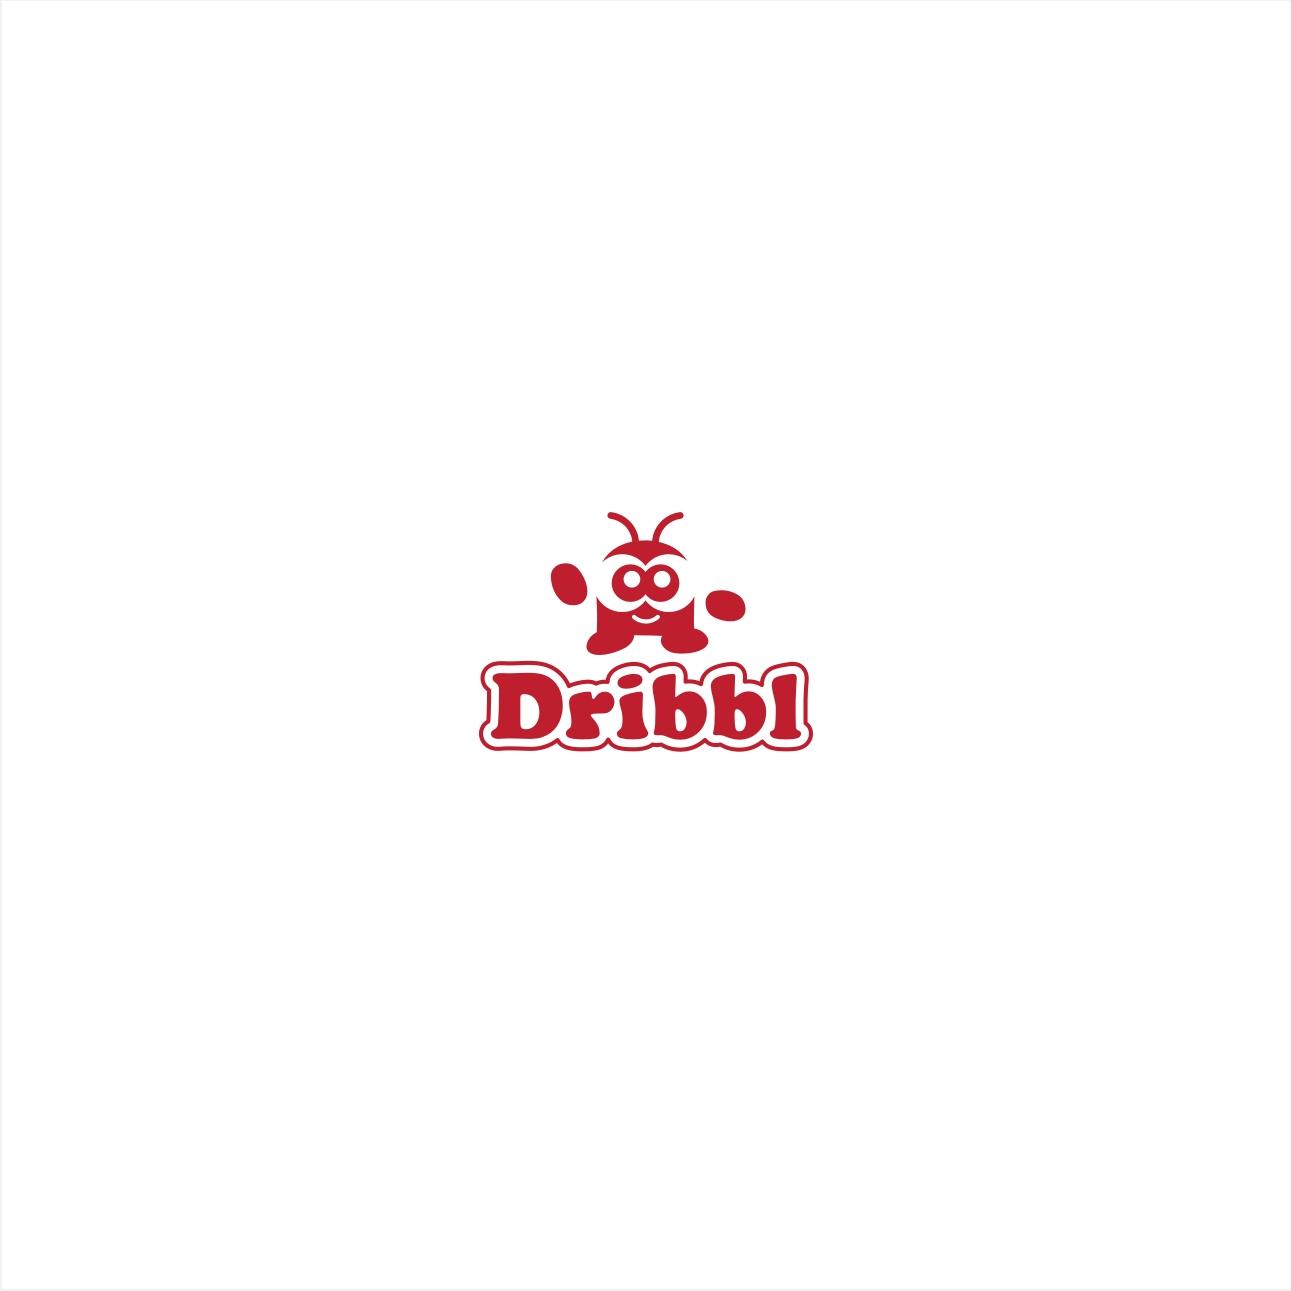 Разработка логотипа для сайта Dribbl.ru фото f_5595aa027b3a220b.jpg